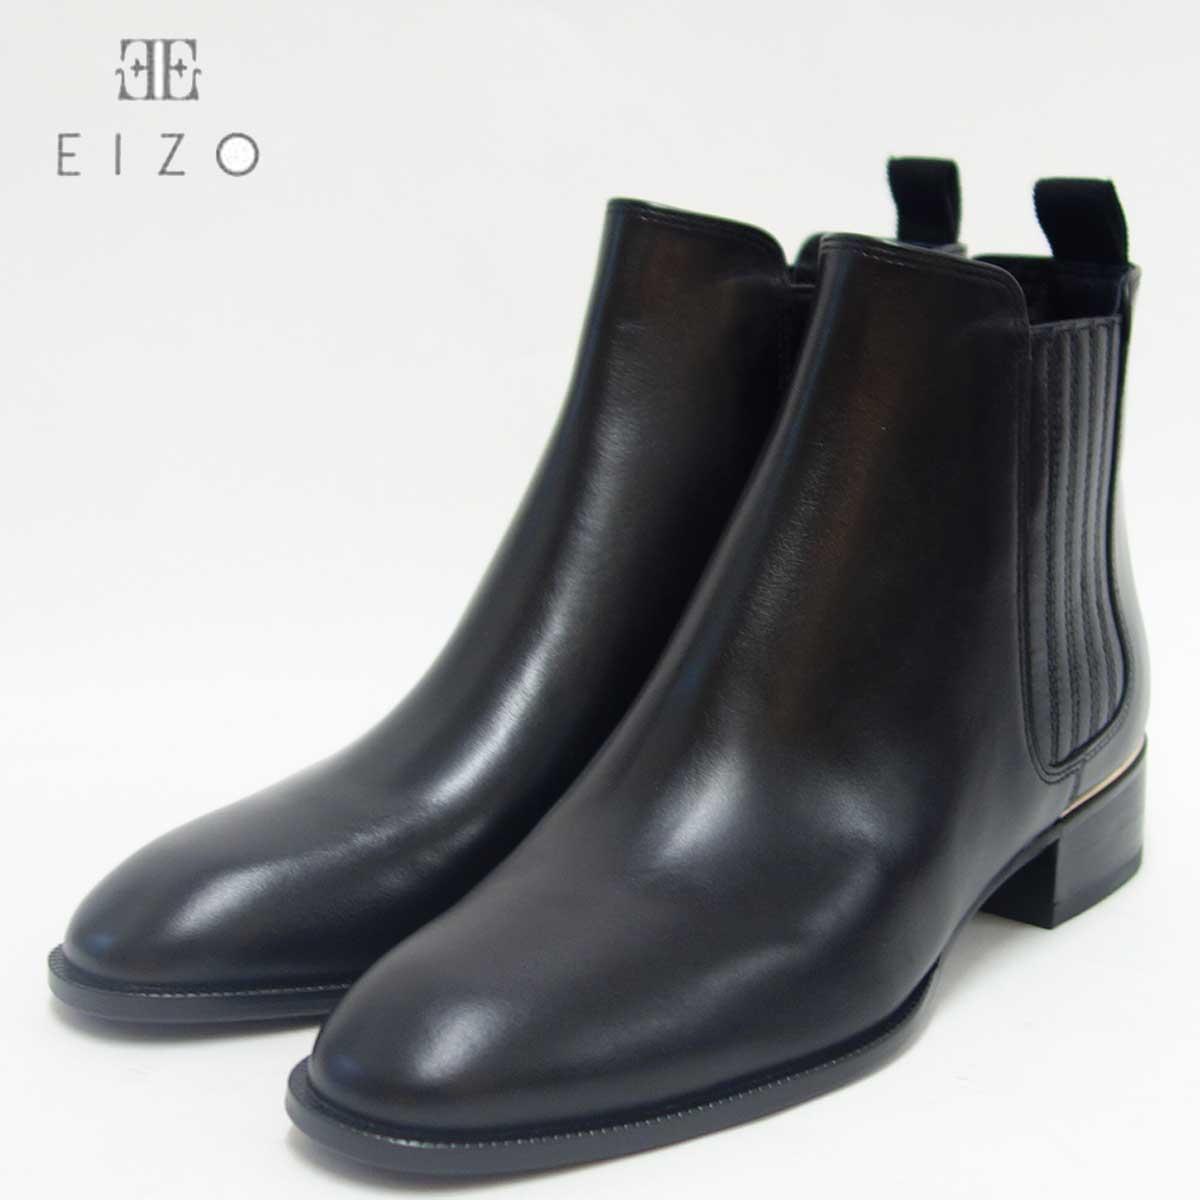 Chuchoter シュショテ per eizo 73877 ブラックシンプルフォルムのサイドゴアブーツ「靴」